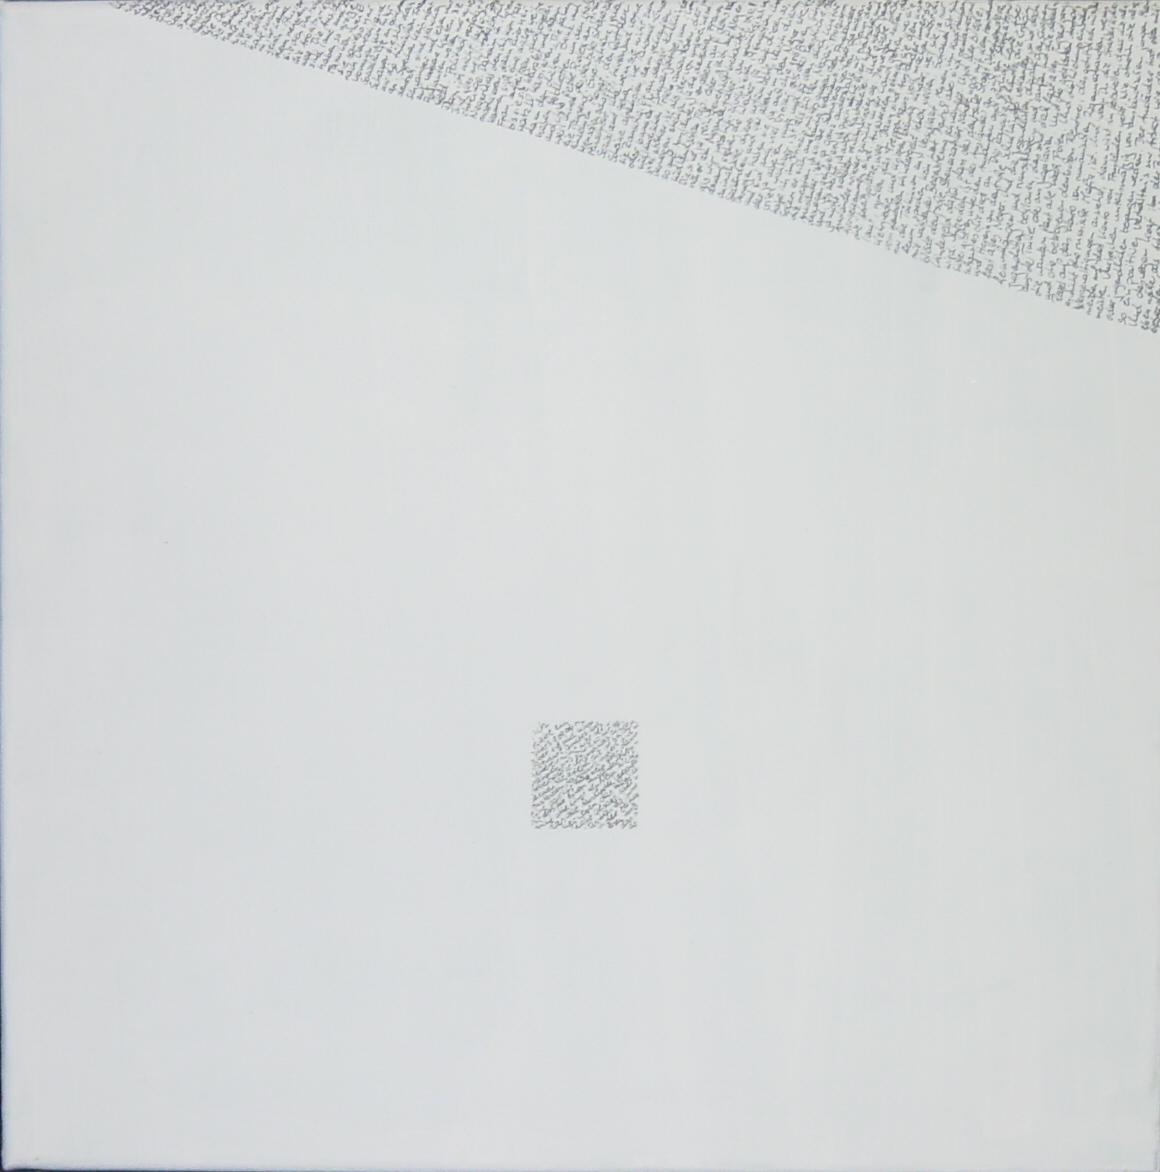 Quadrat und Dreiecvk - harmlos